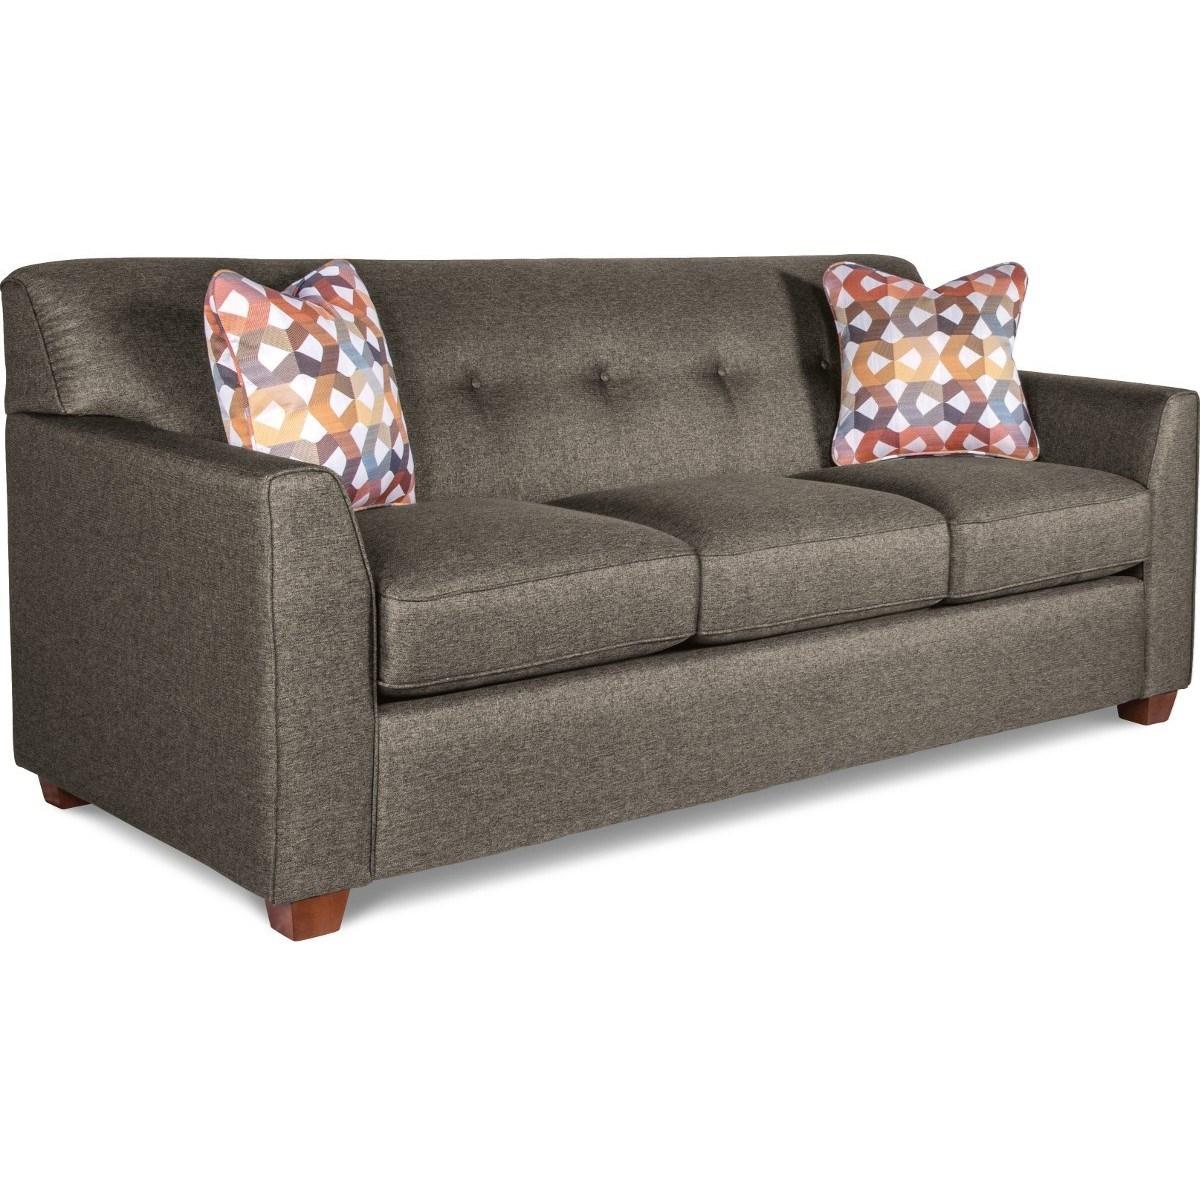 Lazy Boy Sofa Sets: La-Z-Boy Dixie Contemporary Tufted Apartment Sofa With